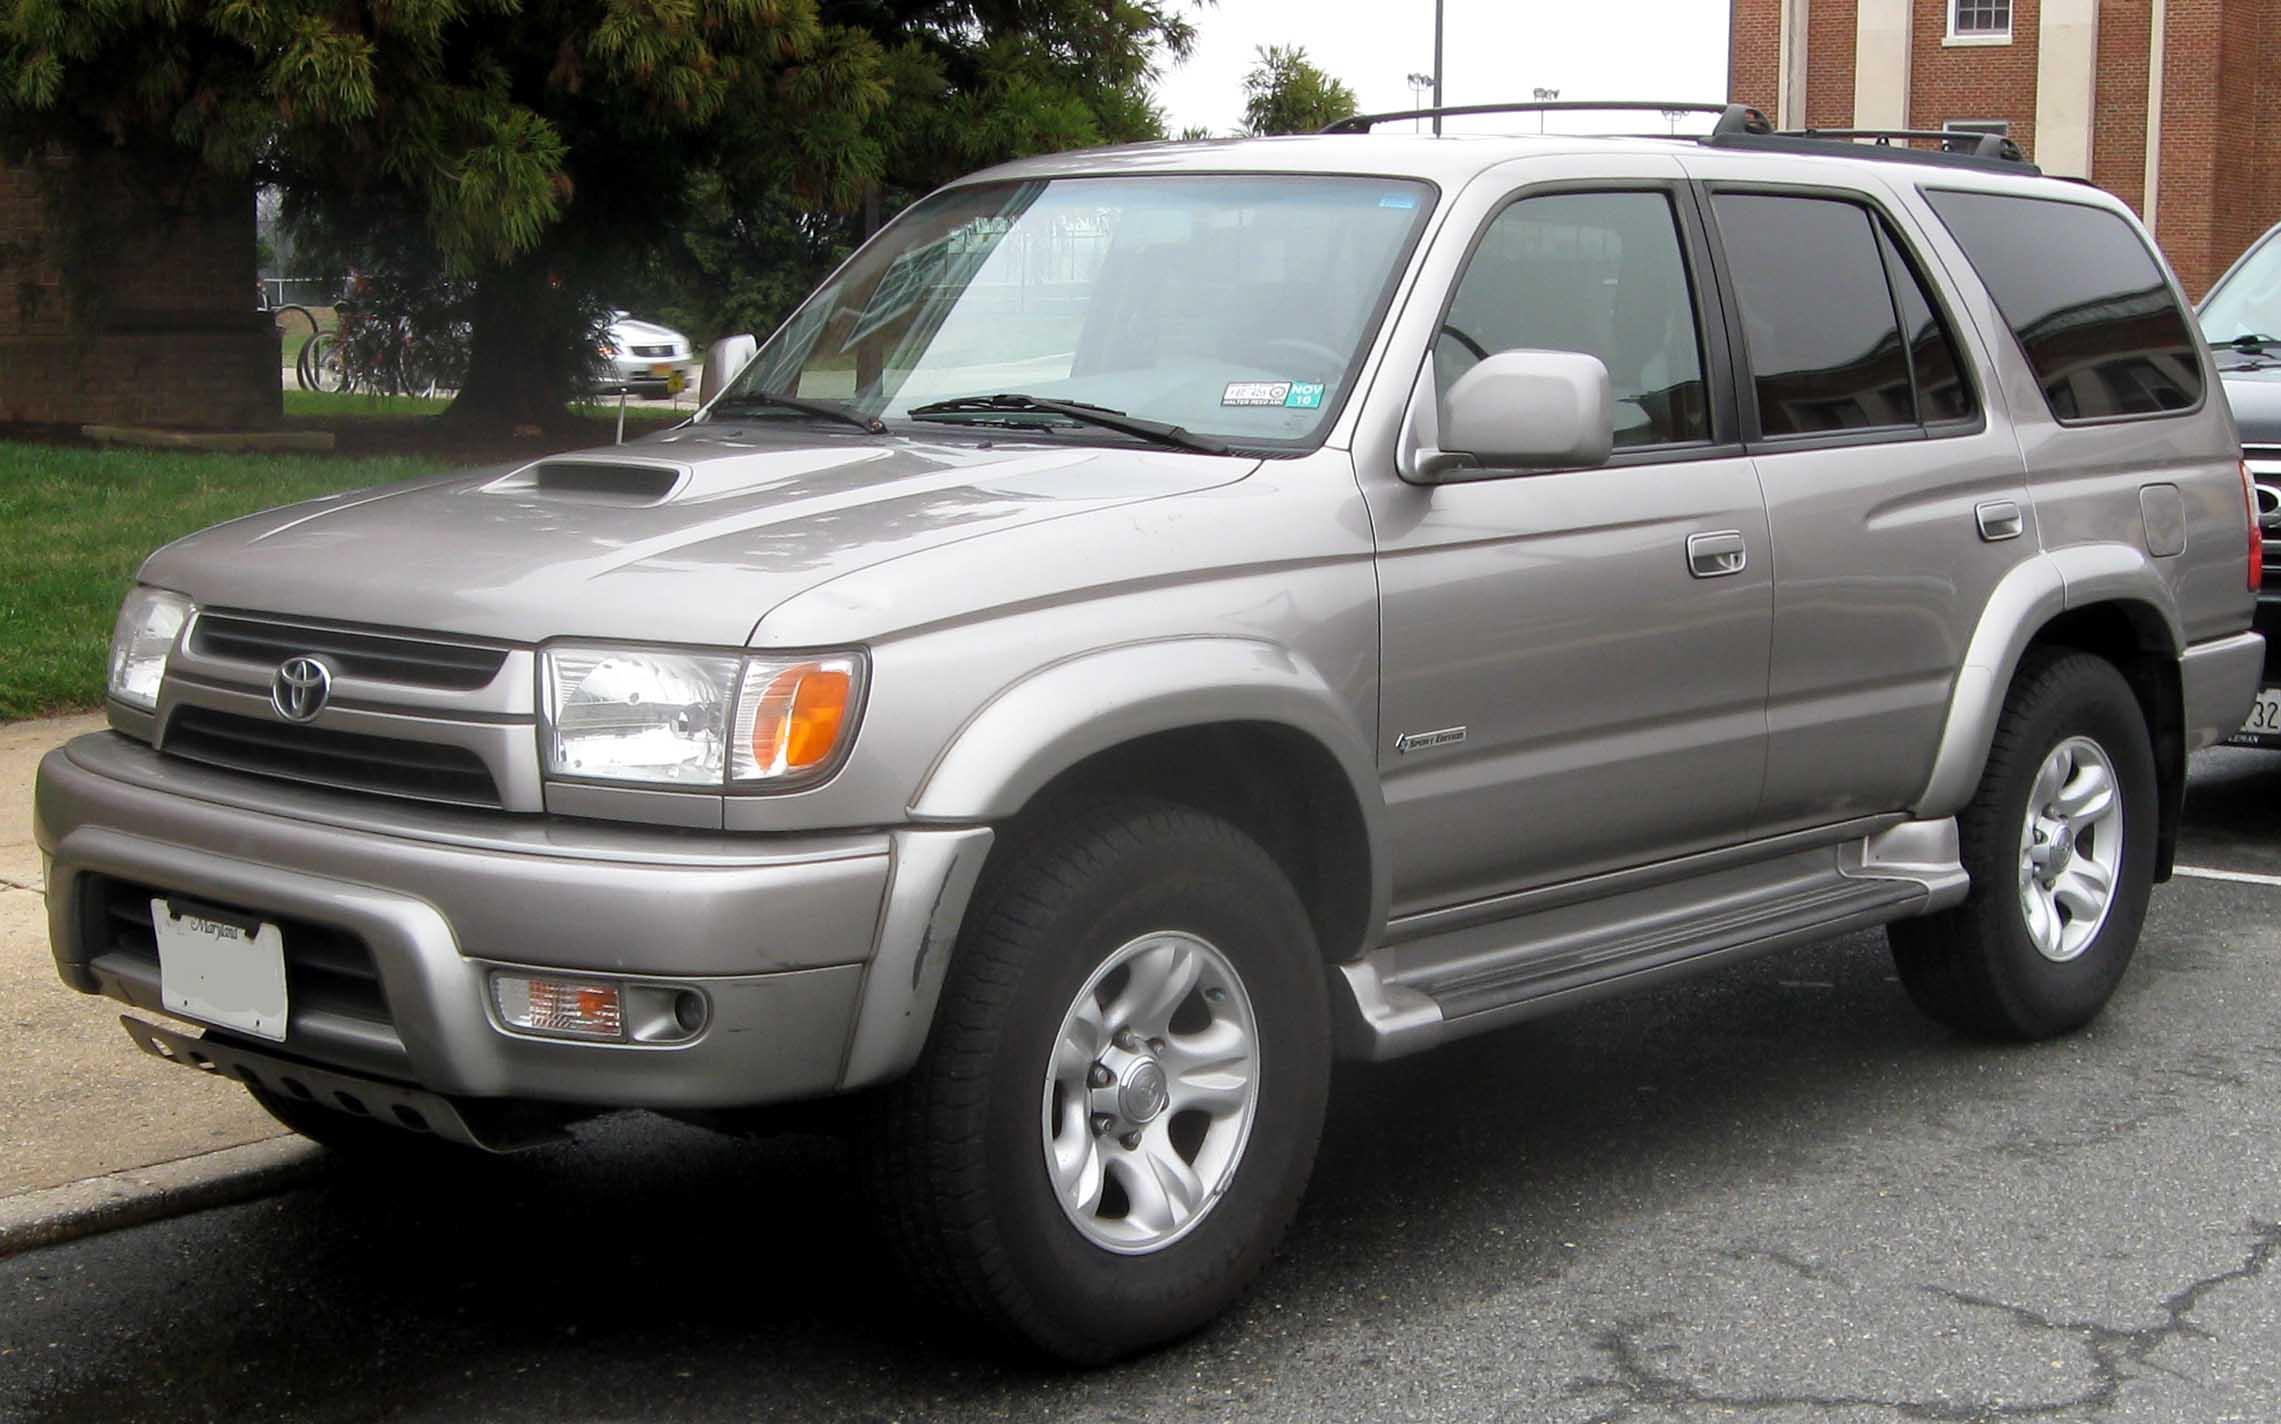 1999 Toyota 4runner Image 7